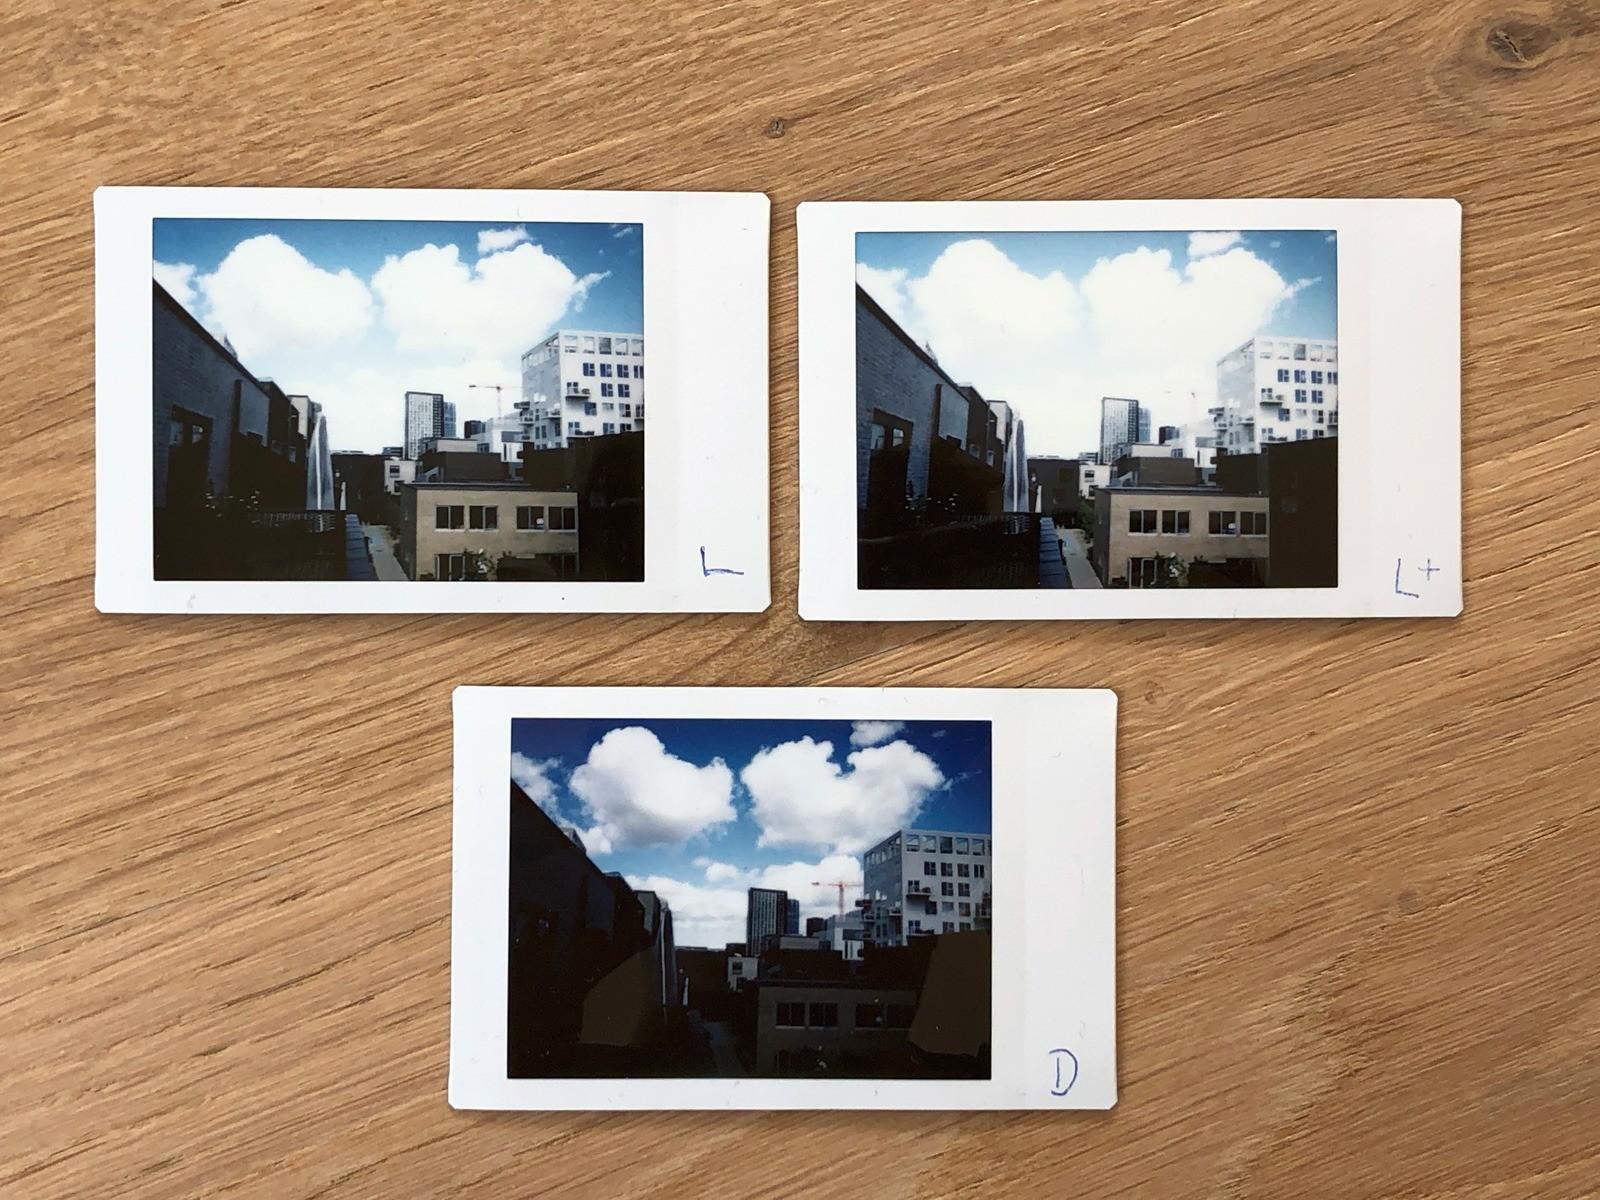 Fujifilm Instax Neo Classic Mini 90 - fotokvalitet test 3